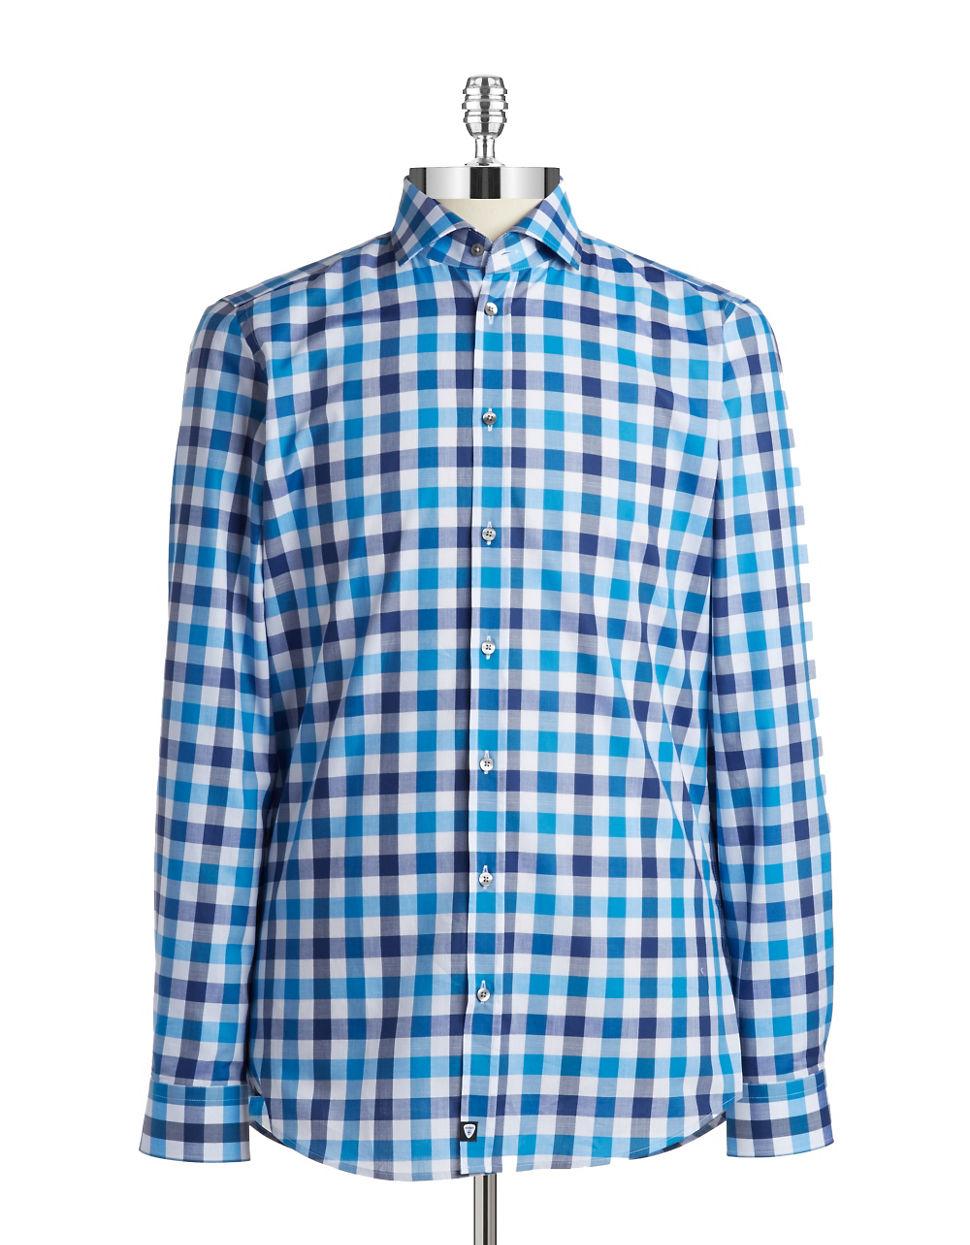 strellson slim fit plaid sportshirt in blue for men lyst. Black Bedroom Furniture Sets. Home Design Ideas